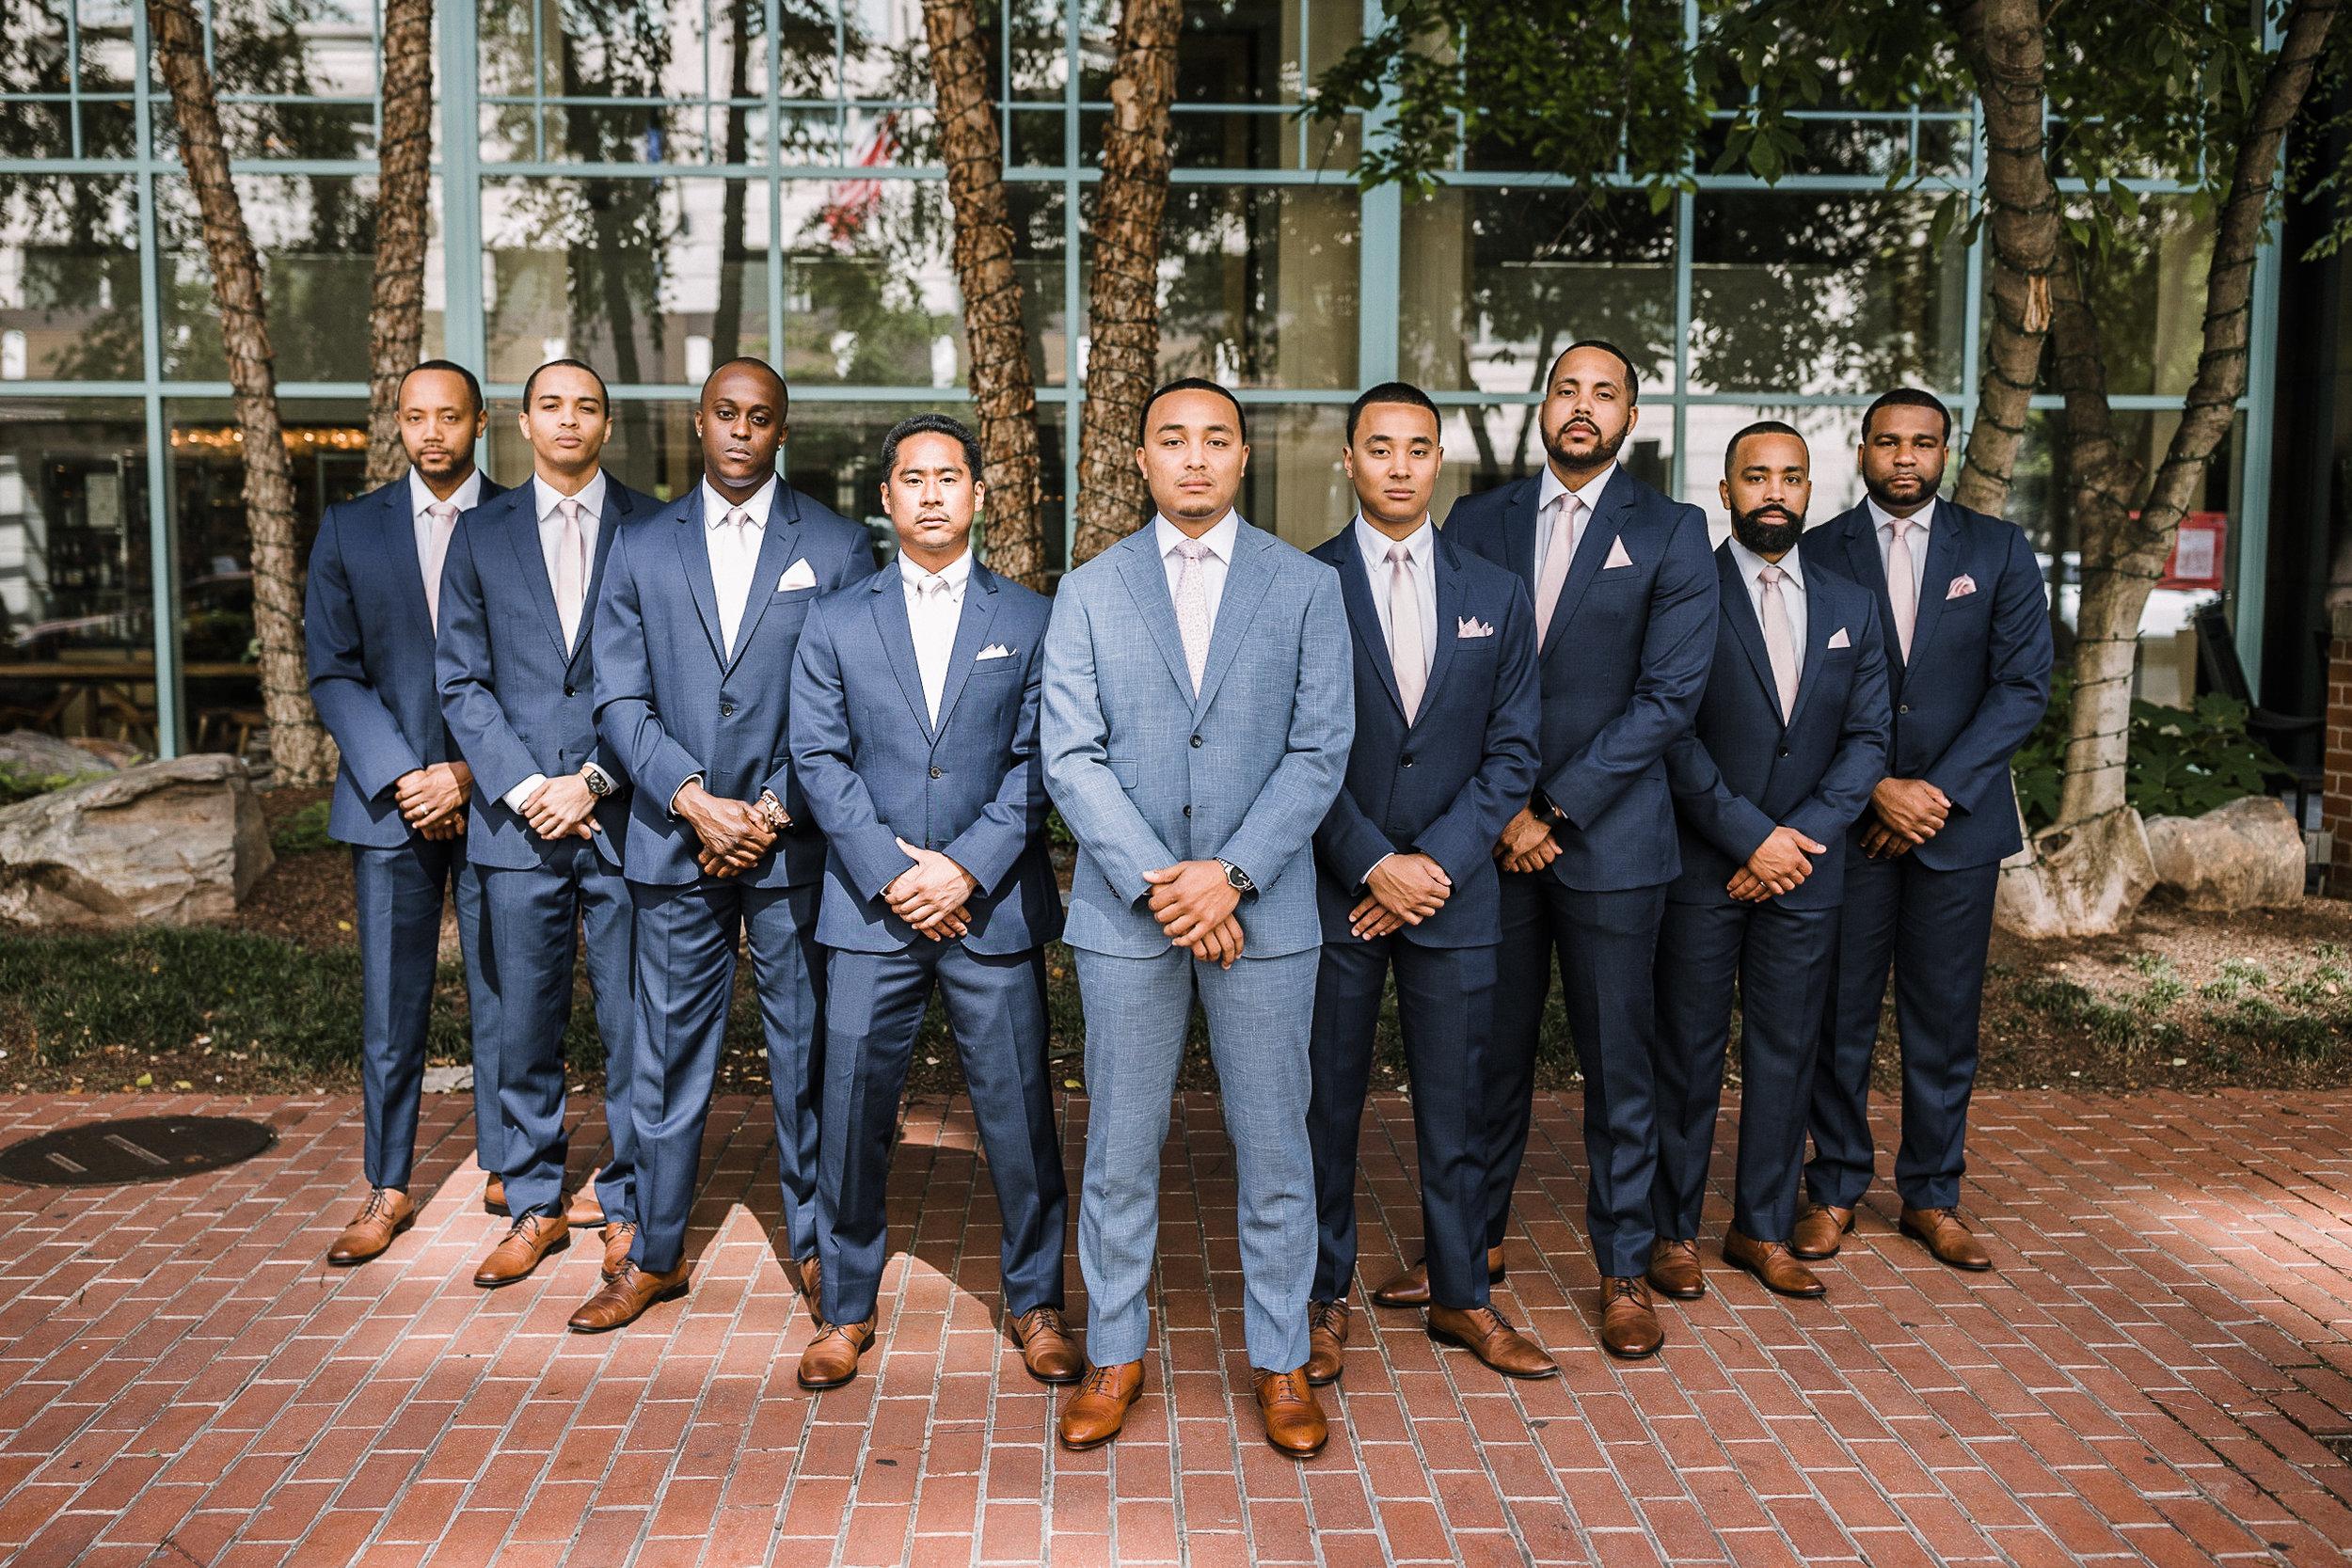 groom and groomsmen posing at The Park Hyatt Hotel in Washington DC